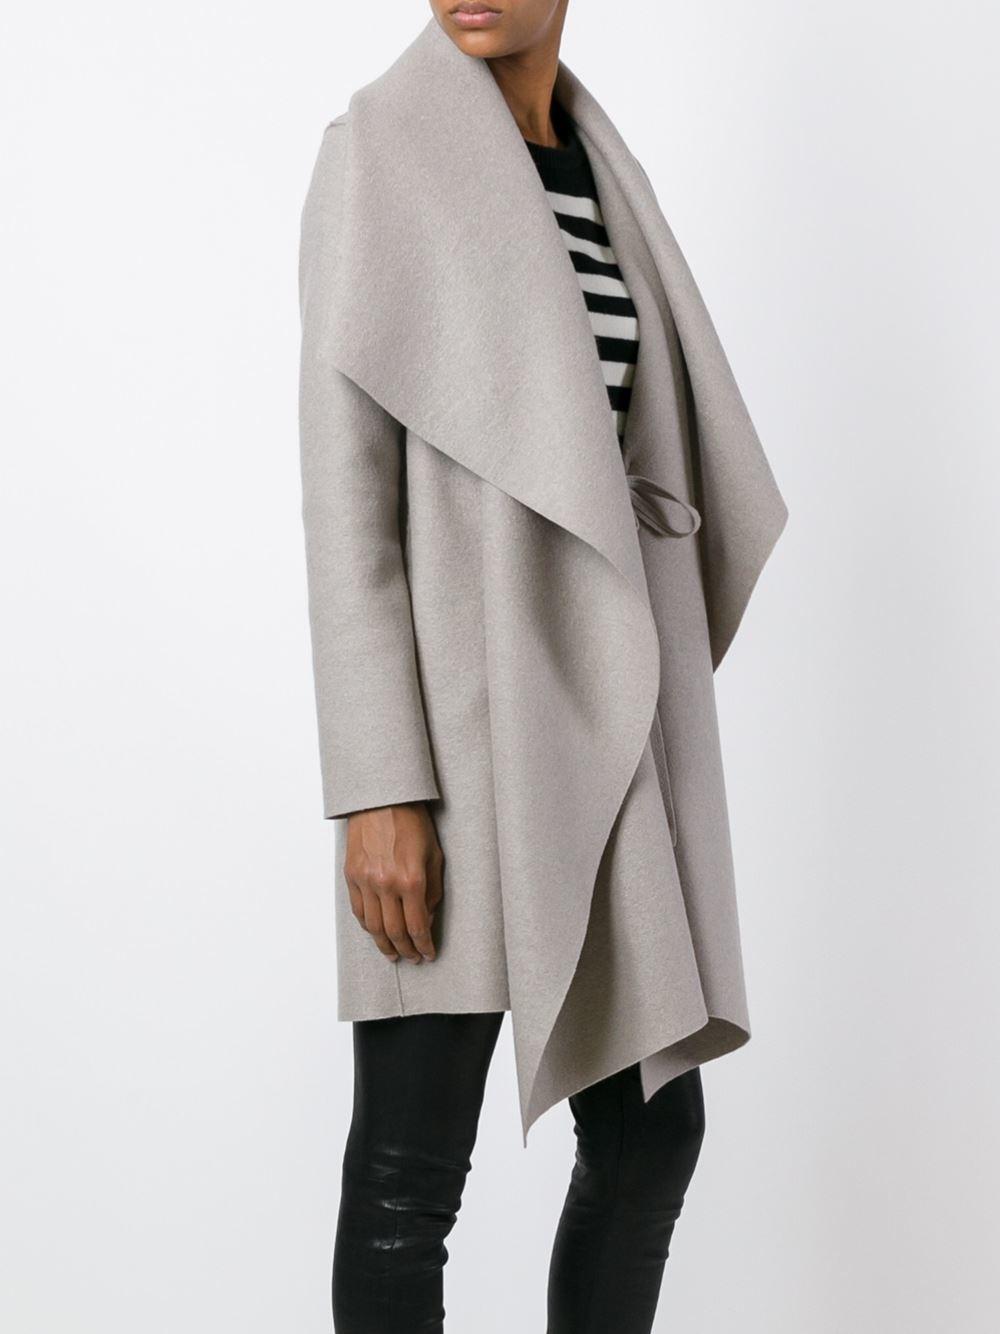 lyst harris wharf london blanket coat in gray. Black Bedroom Furniture Sets. Home Design Ideas